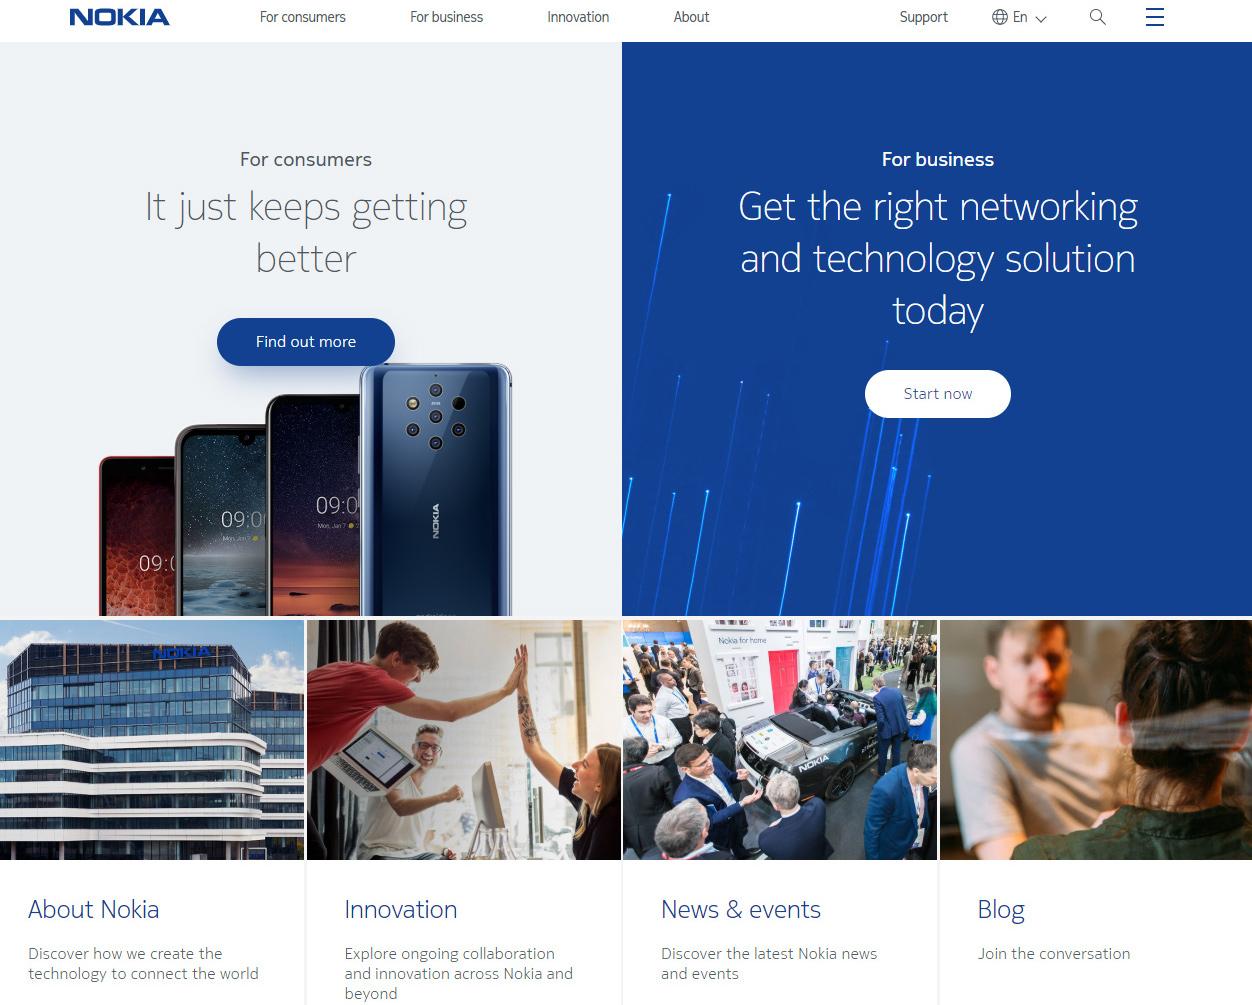 nokia website